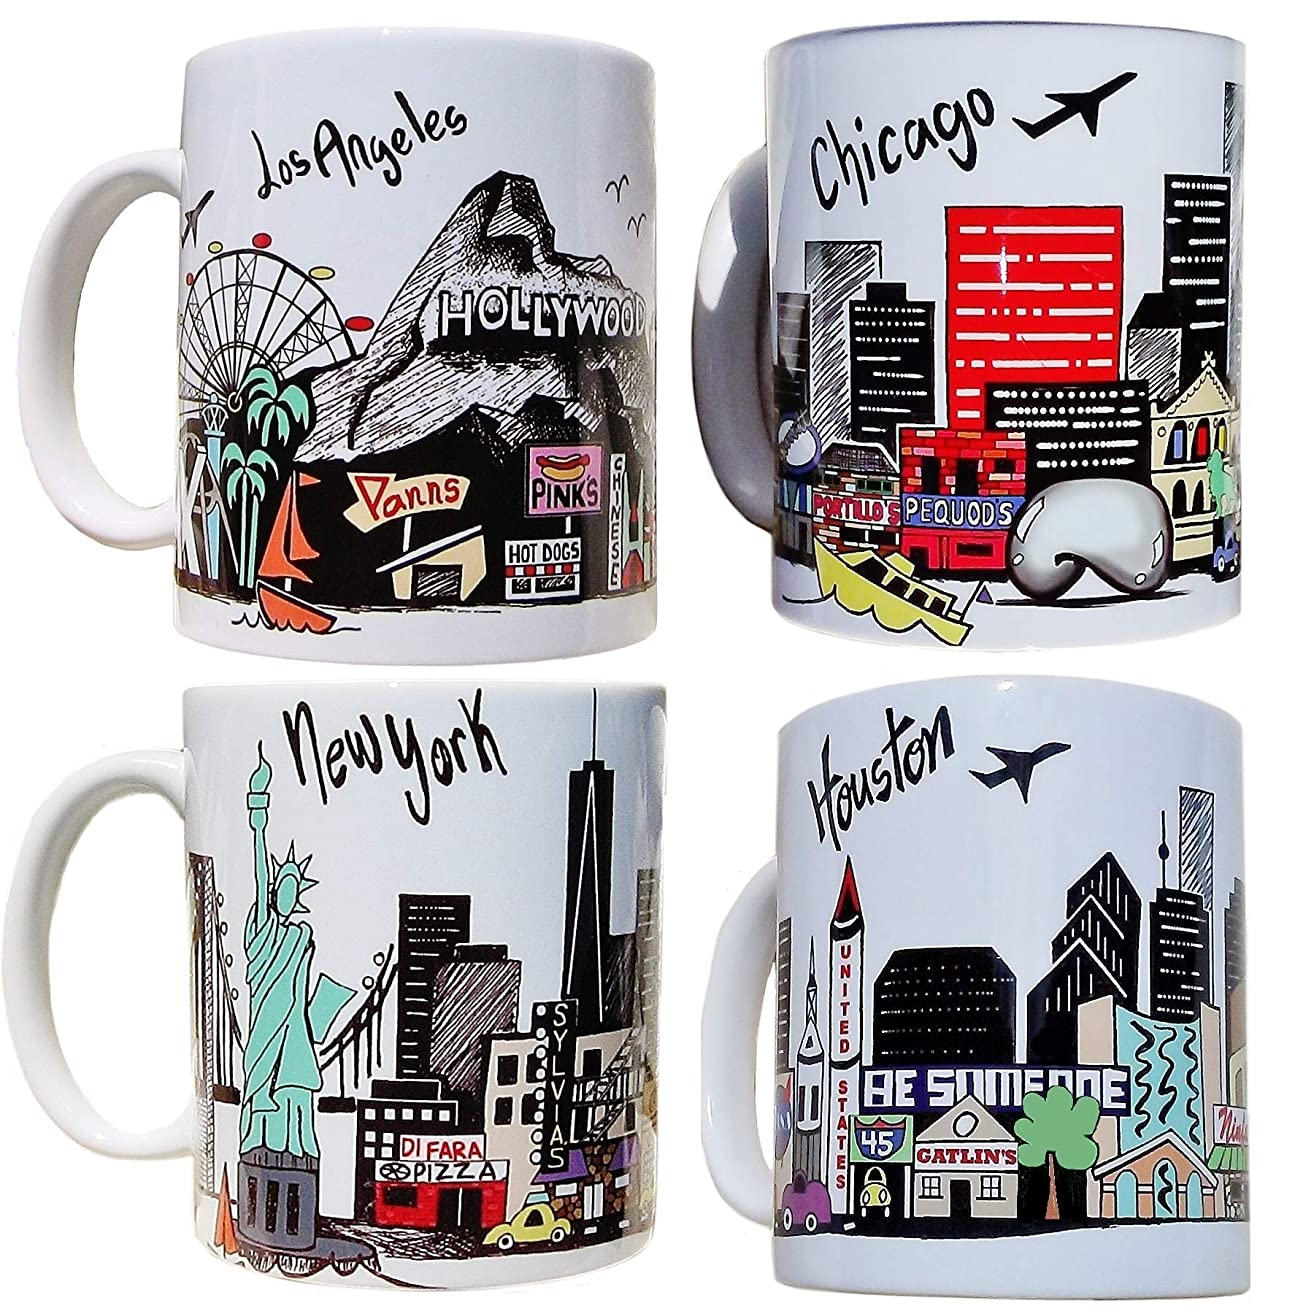 Los Angeles - New York - Chicago - Houston - City Skyline Coffee Mug Set of 4 - Your Choice